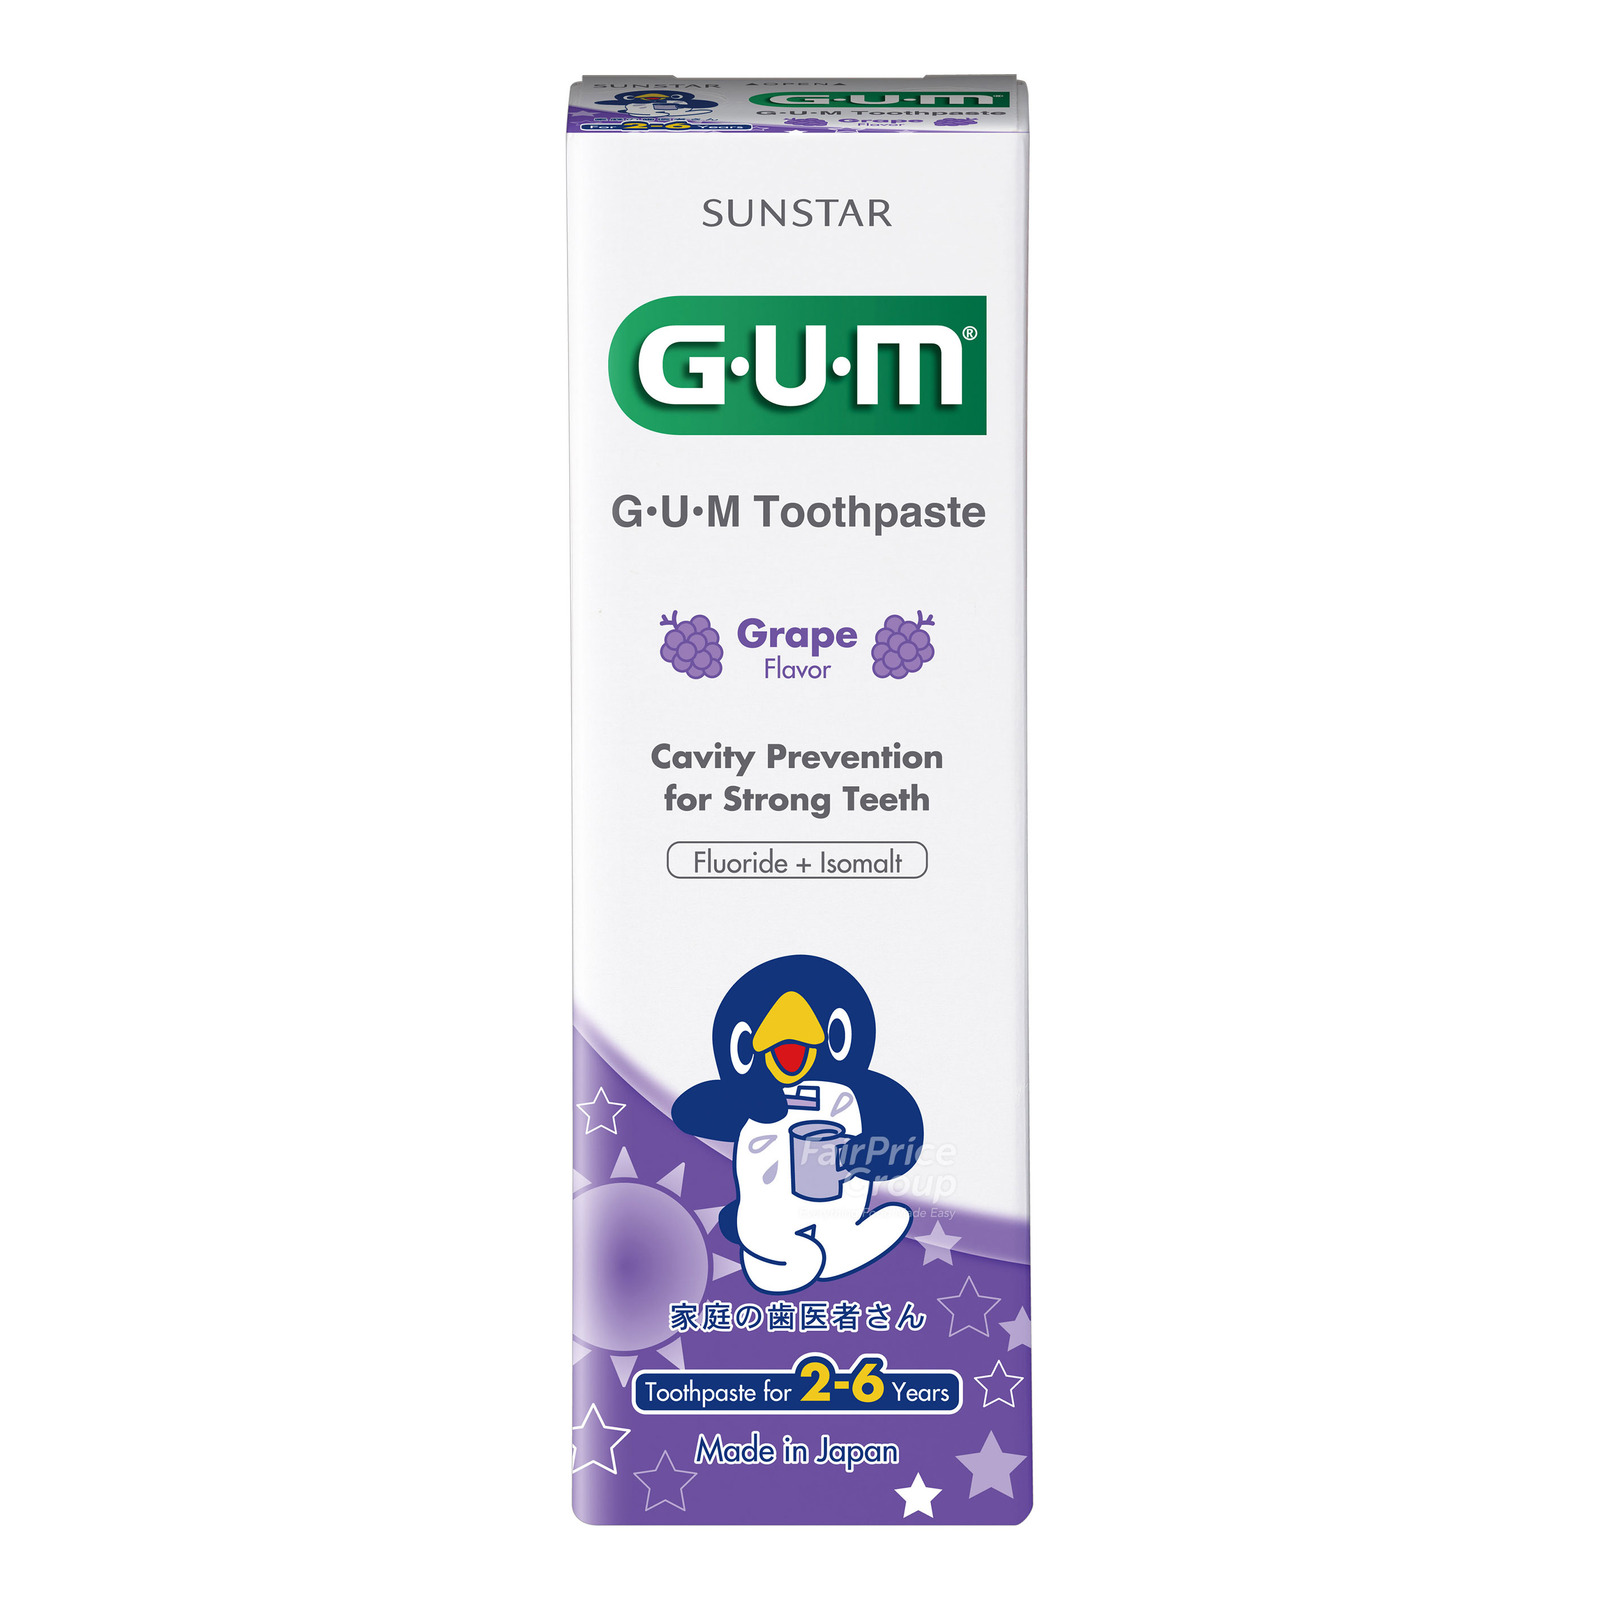 Sunstar G.U.M Toothpaste - Grape (2 - 6 Years)